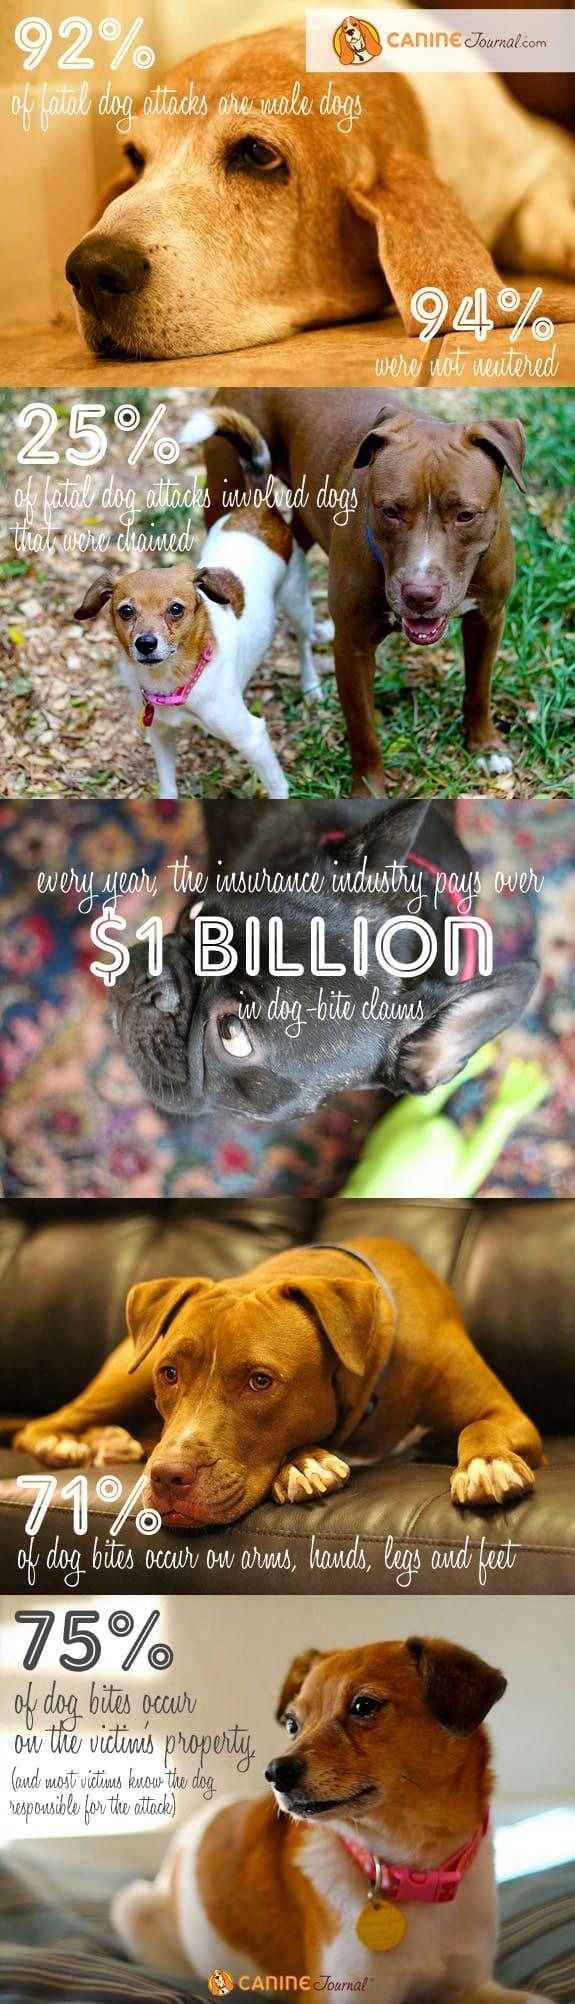 Dog Bite Statistics Infographic